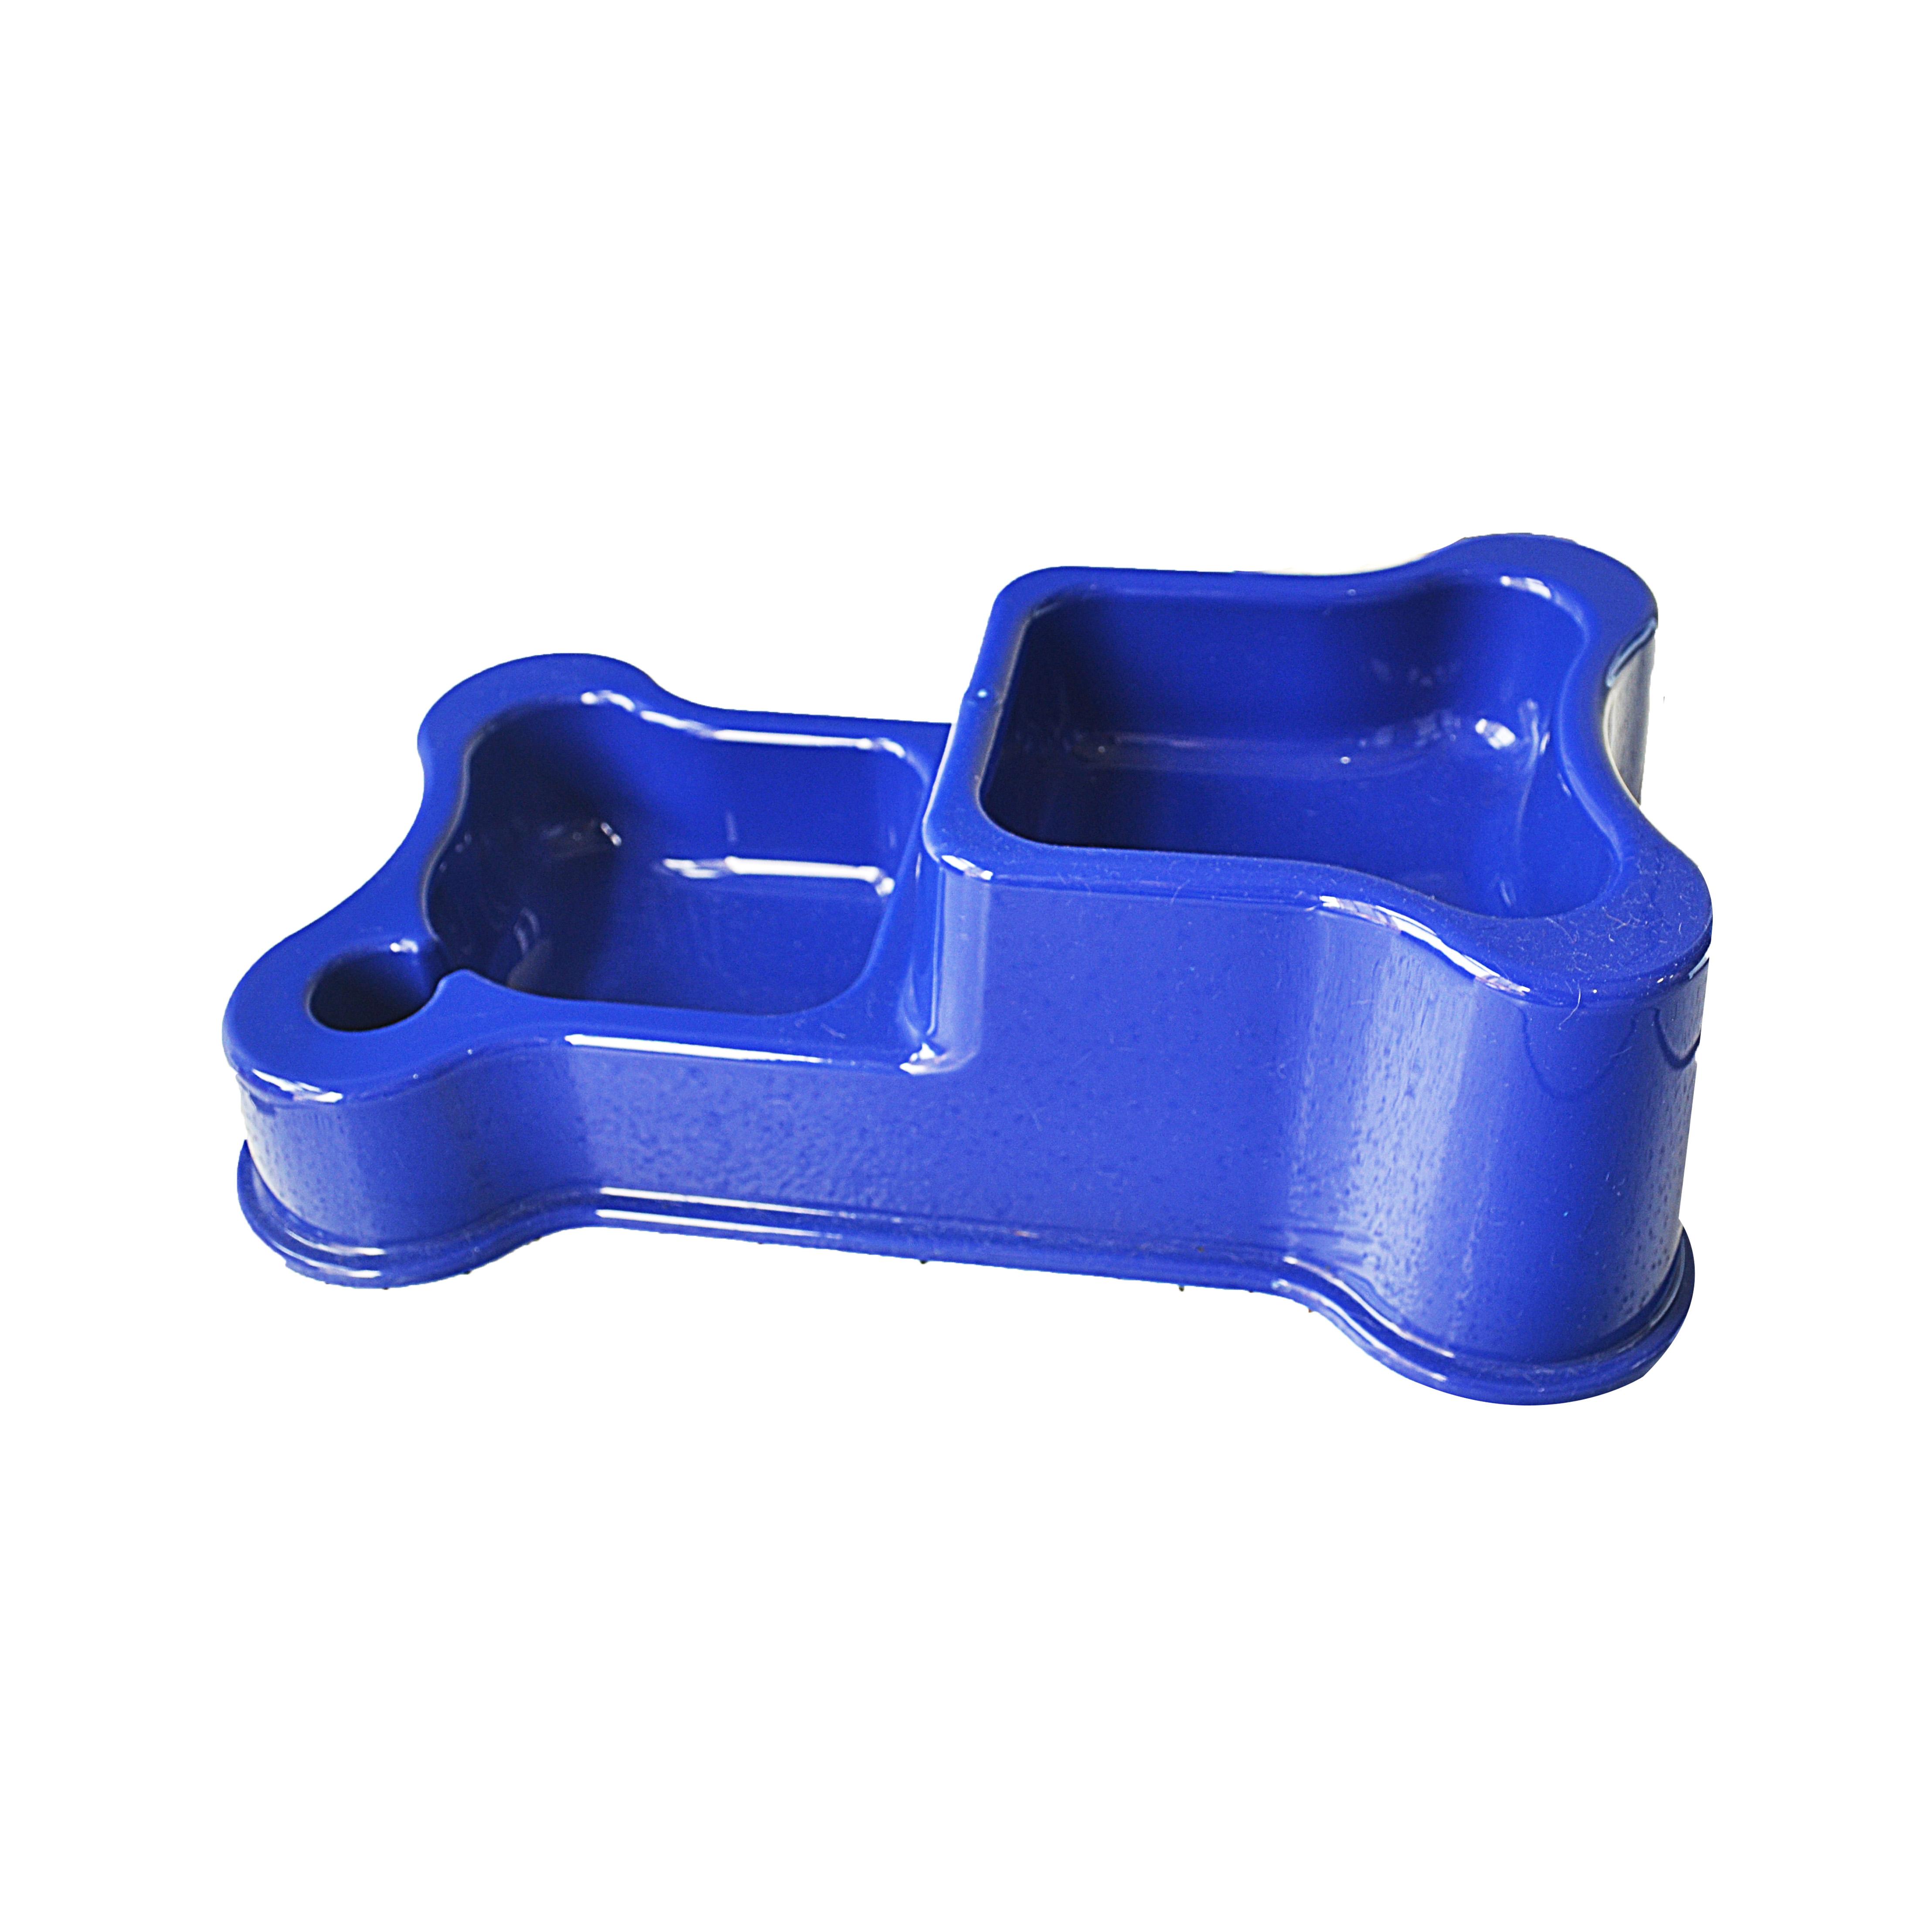 Comedouro e bebedouro duplo style blue anti-formiga